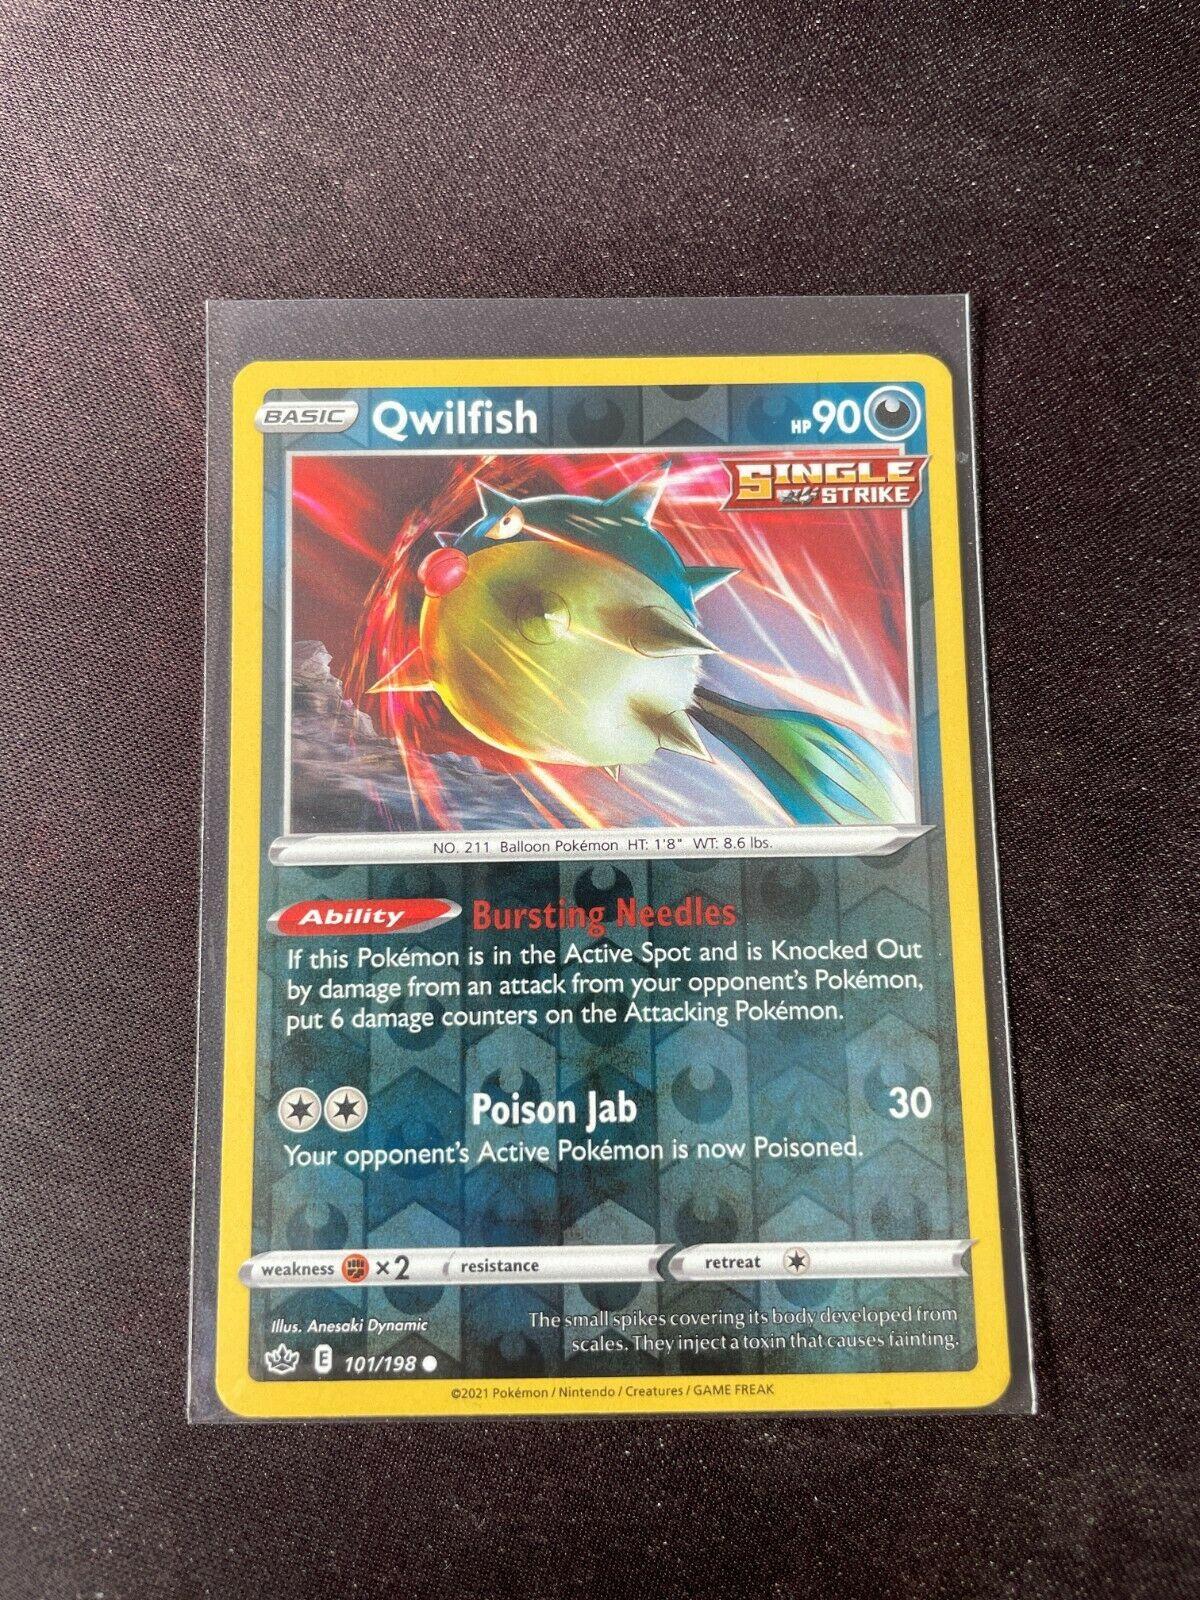 Pokemon TCG Chilling Reign 101/198 Qwilfish Card Fresh Reverse Holo Mint Rare